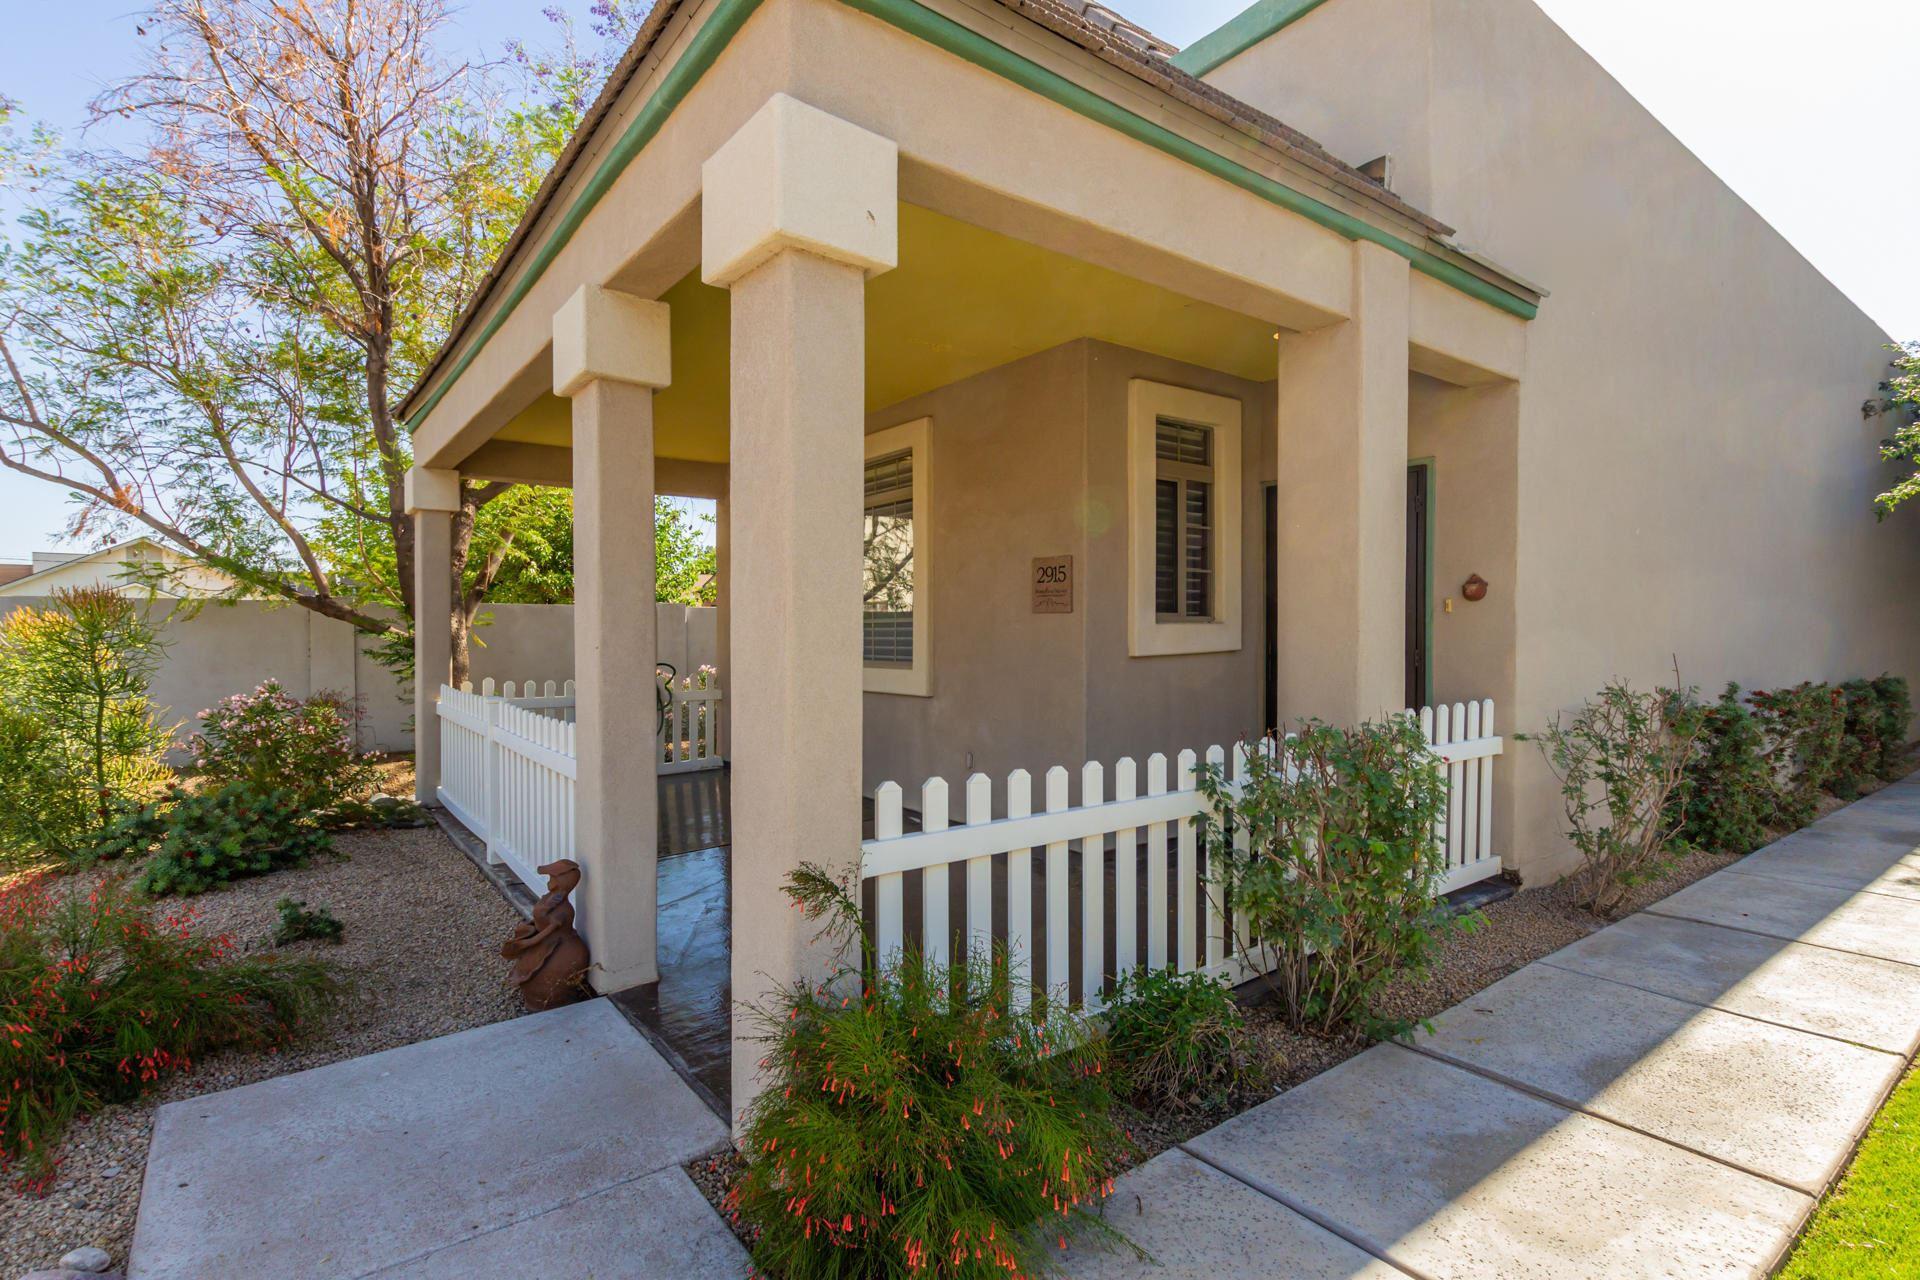 2915 N 28th Place, Phoenix, AZ 85016 - MLS#: 6226170